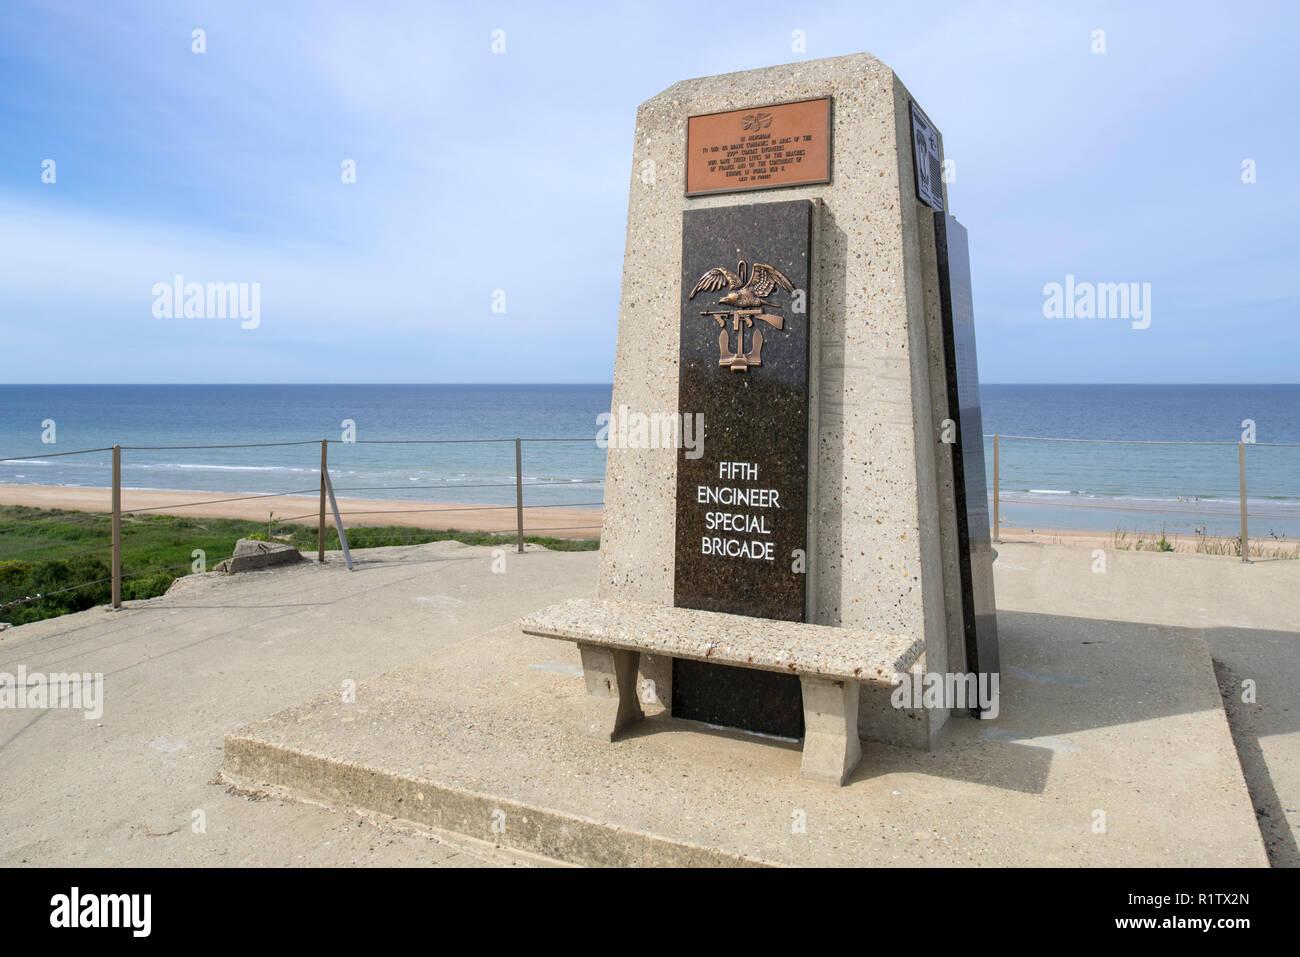 Fifth Engineer Special Brigade Memorial at Omaha Beach, Colleville-sur-Mer, Calvados, Normandy, France Stock Photo